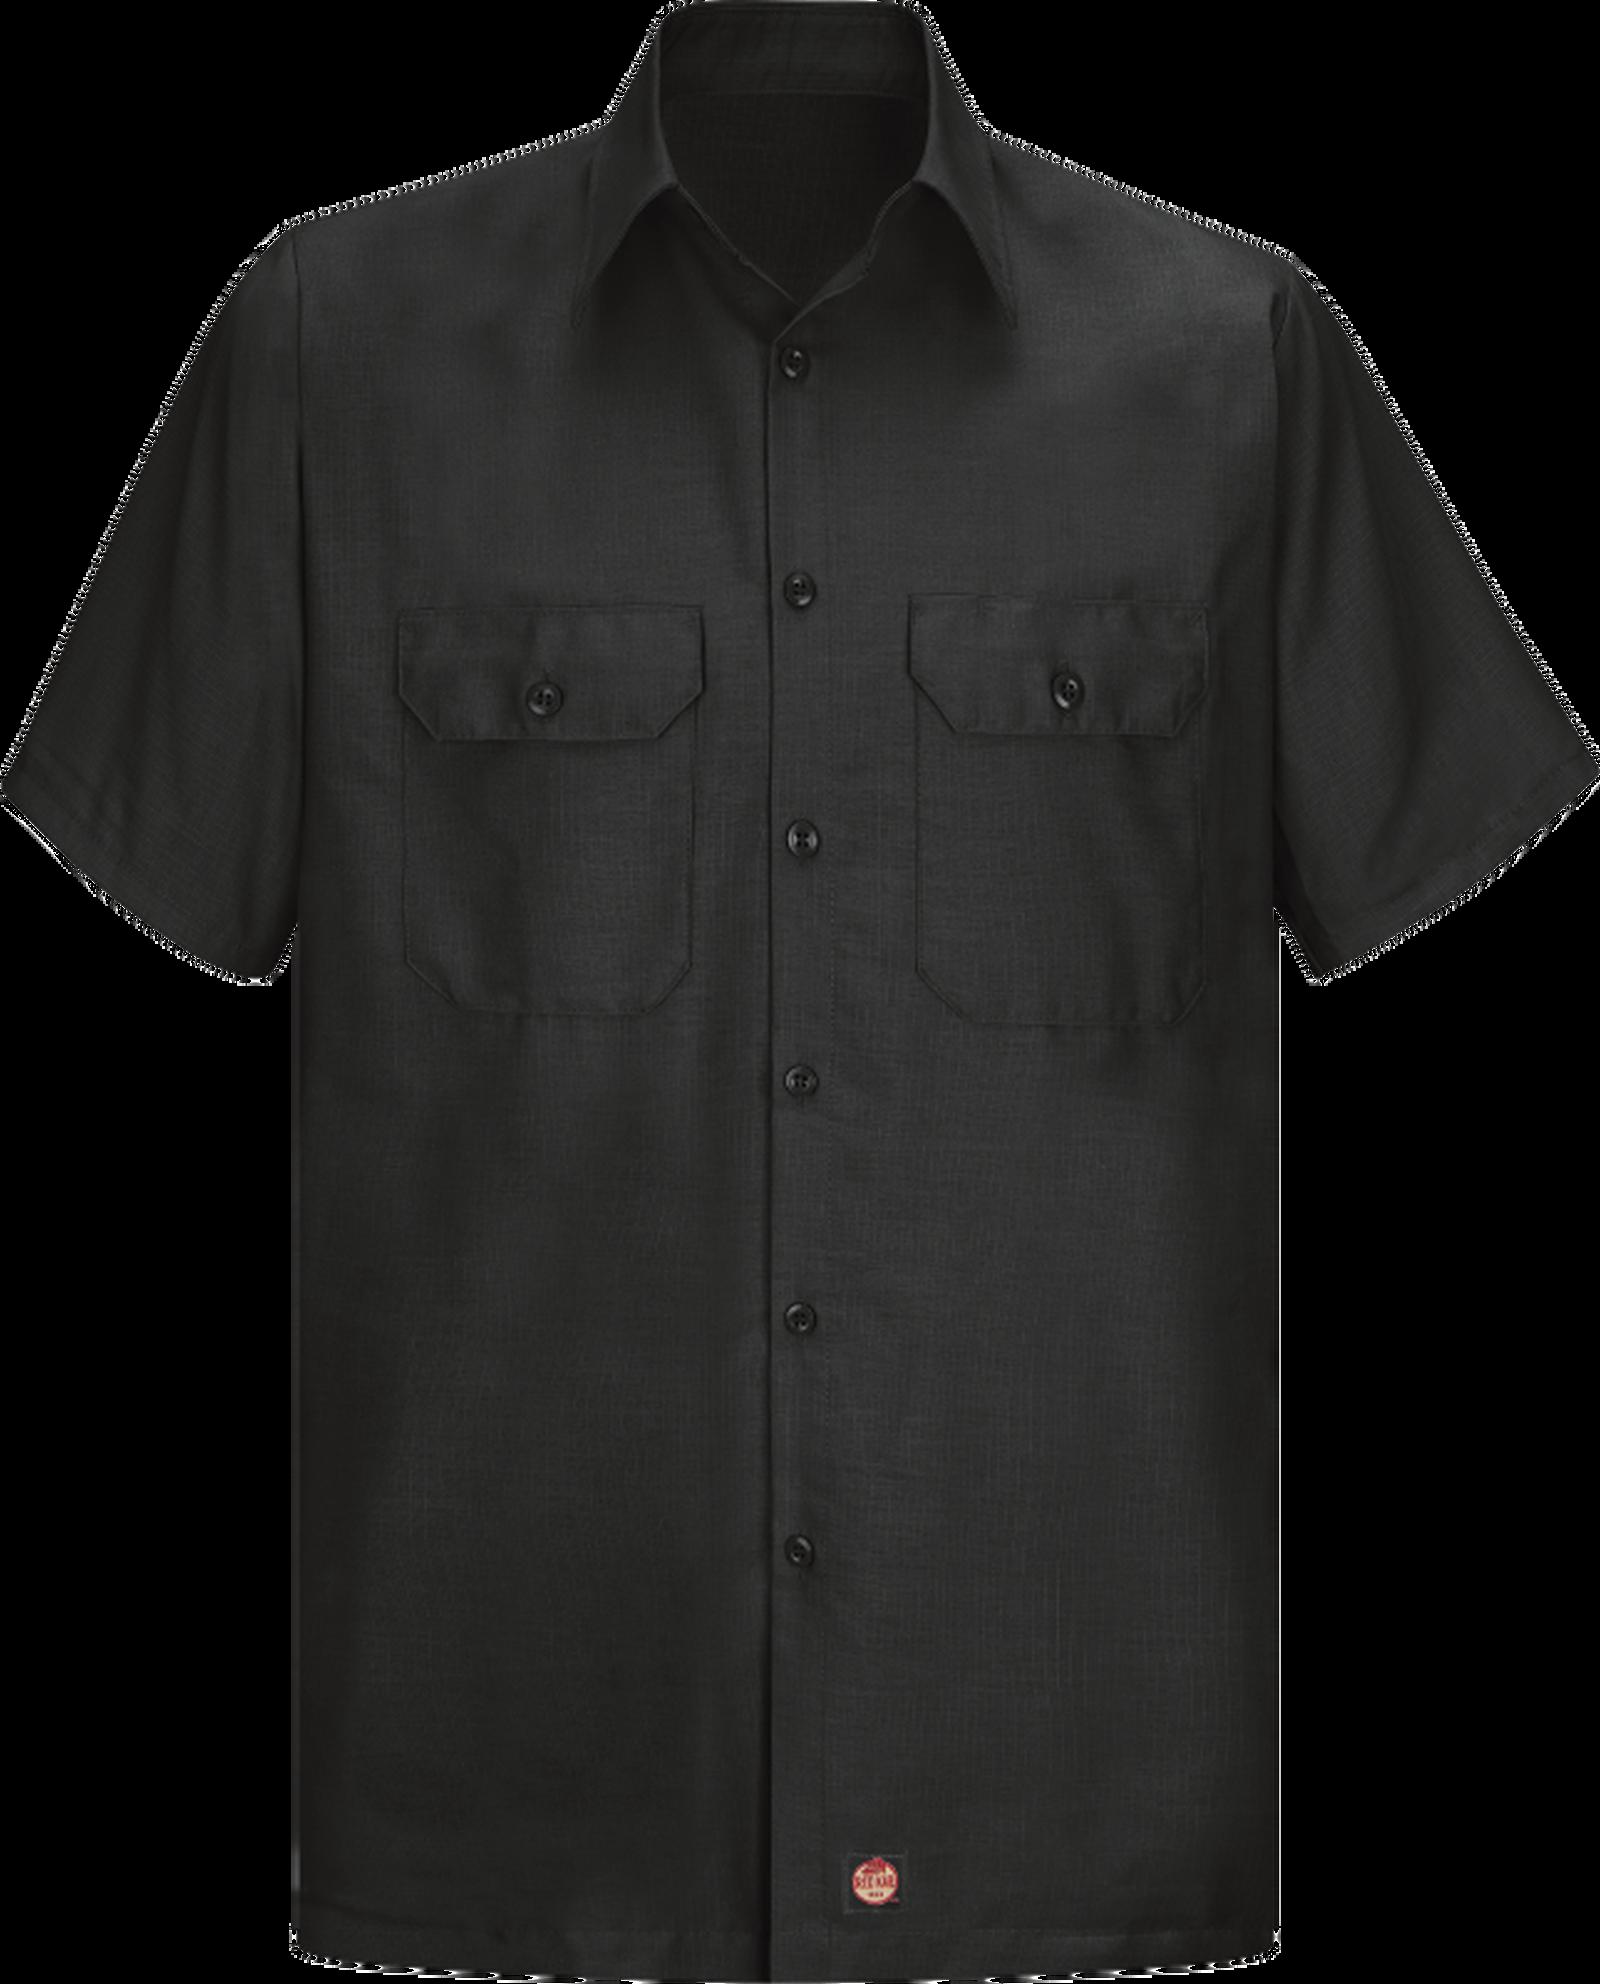 Men's Short Sleeve Solid Rip Stop Shirt